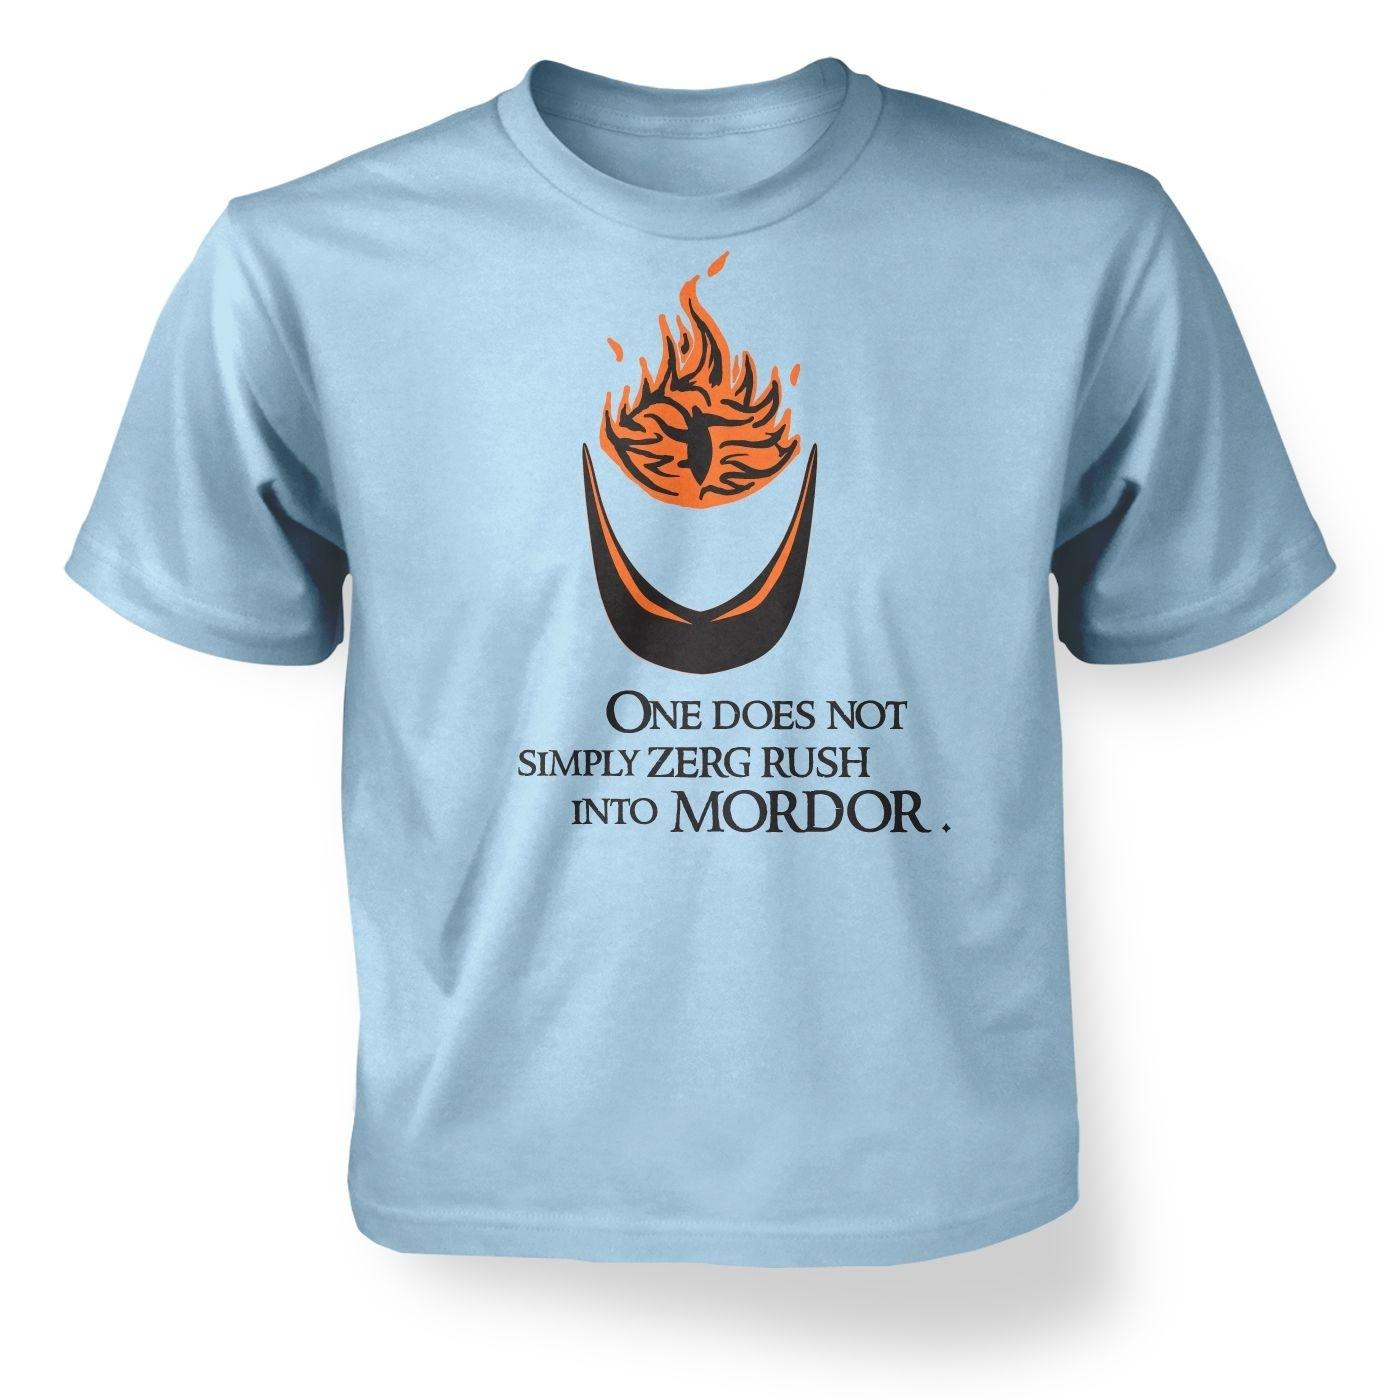 Zerg Rush into Mordor kid's t-shirt